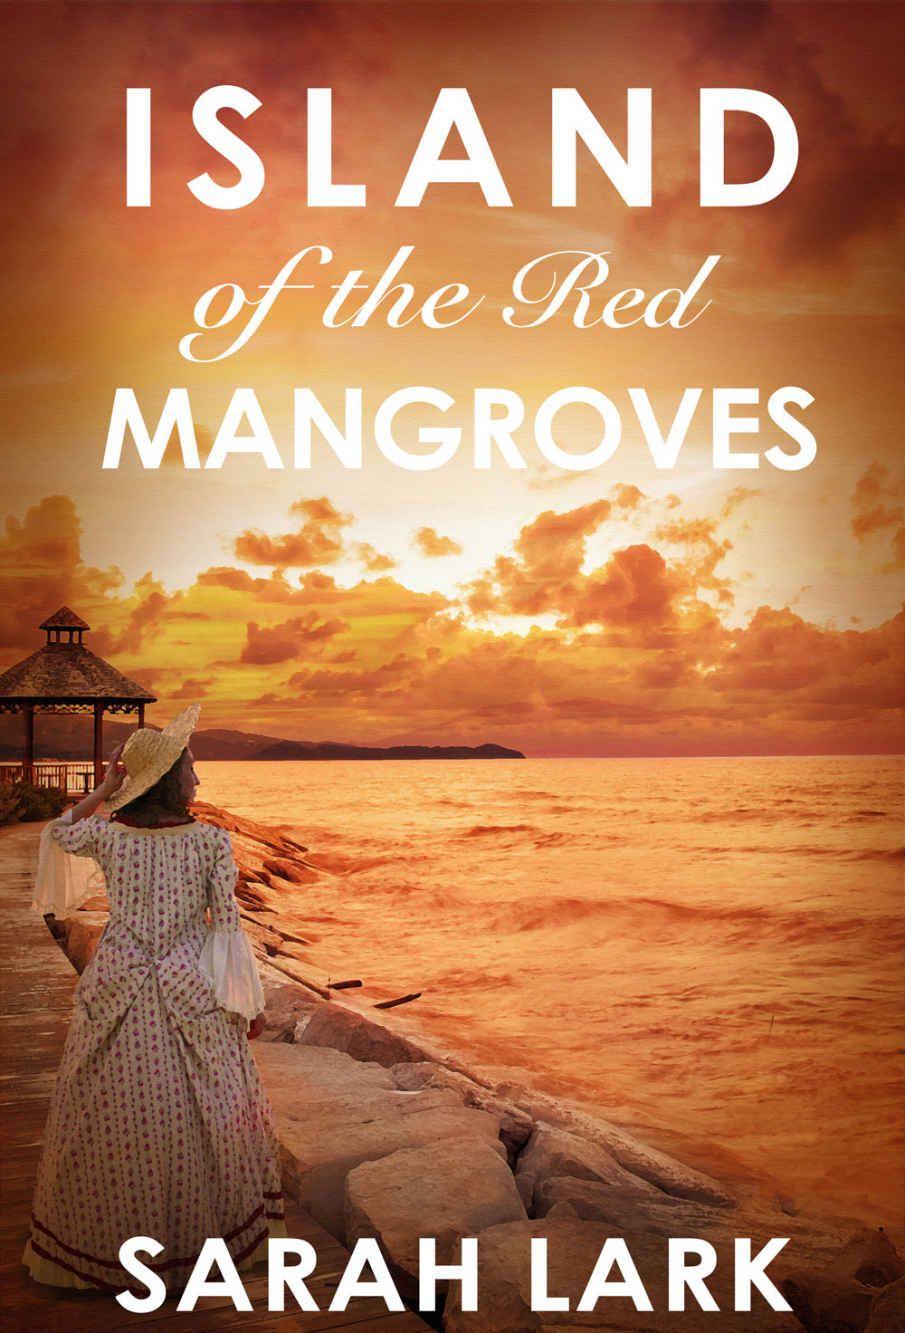 Island of the red mangroves caribbean islands saga book 2